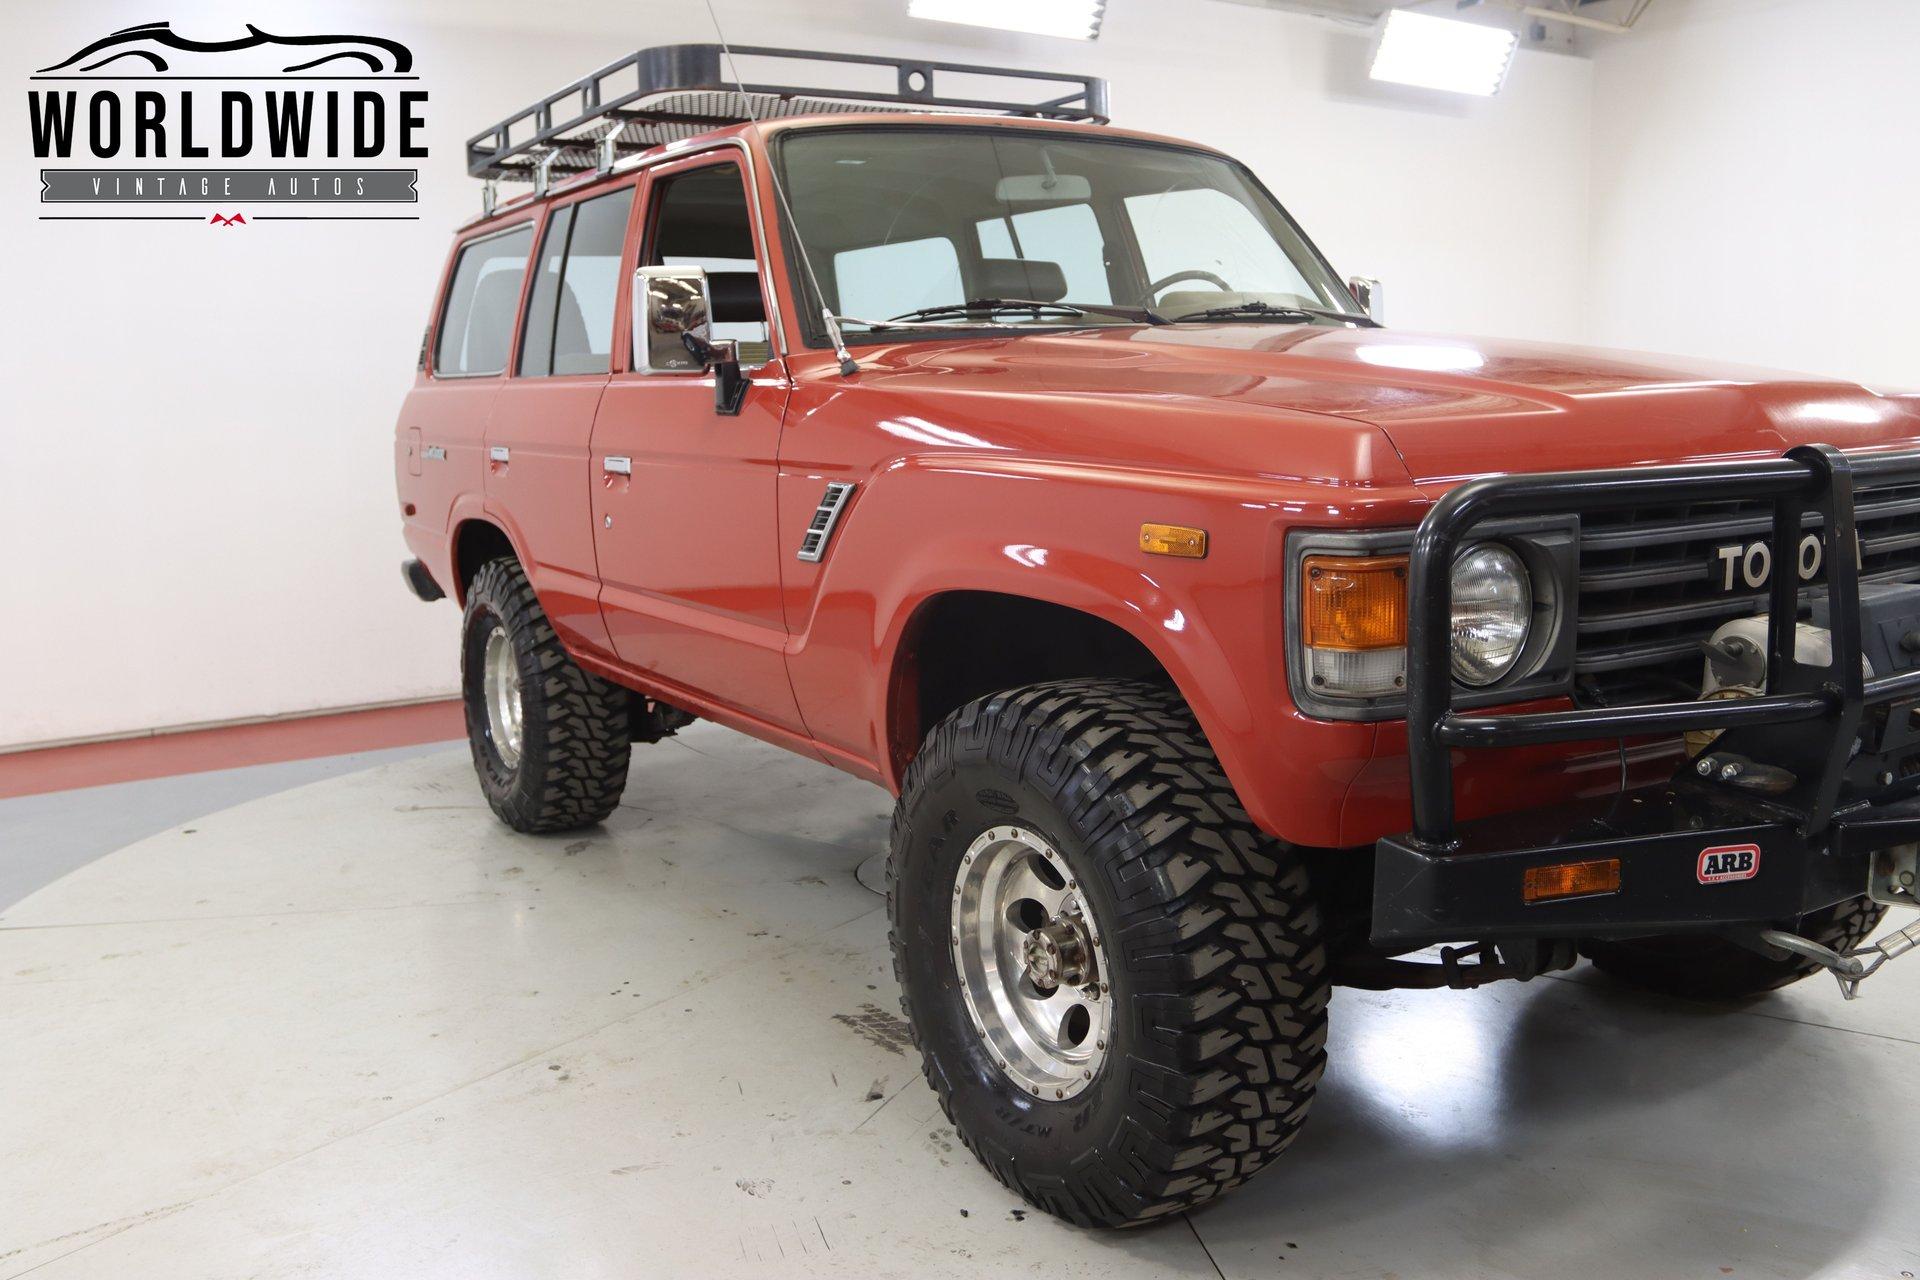 1981 Toyota Land Cruiser Fj60